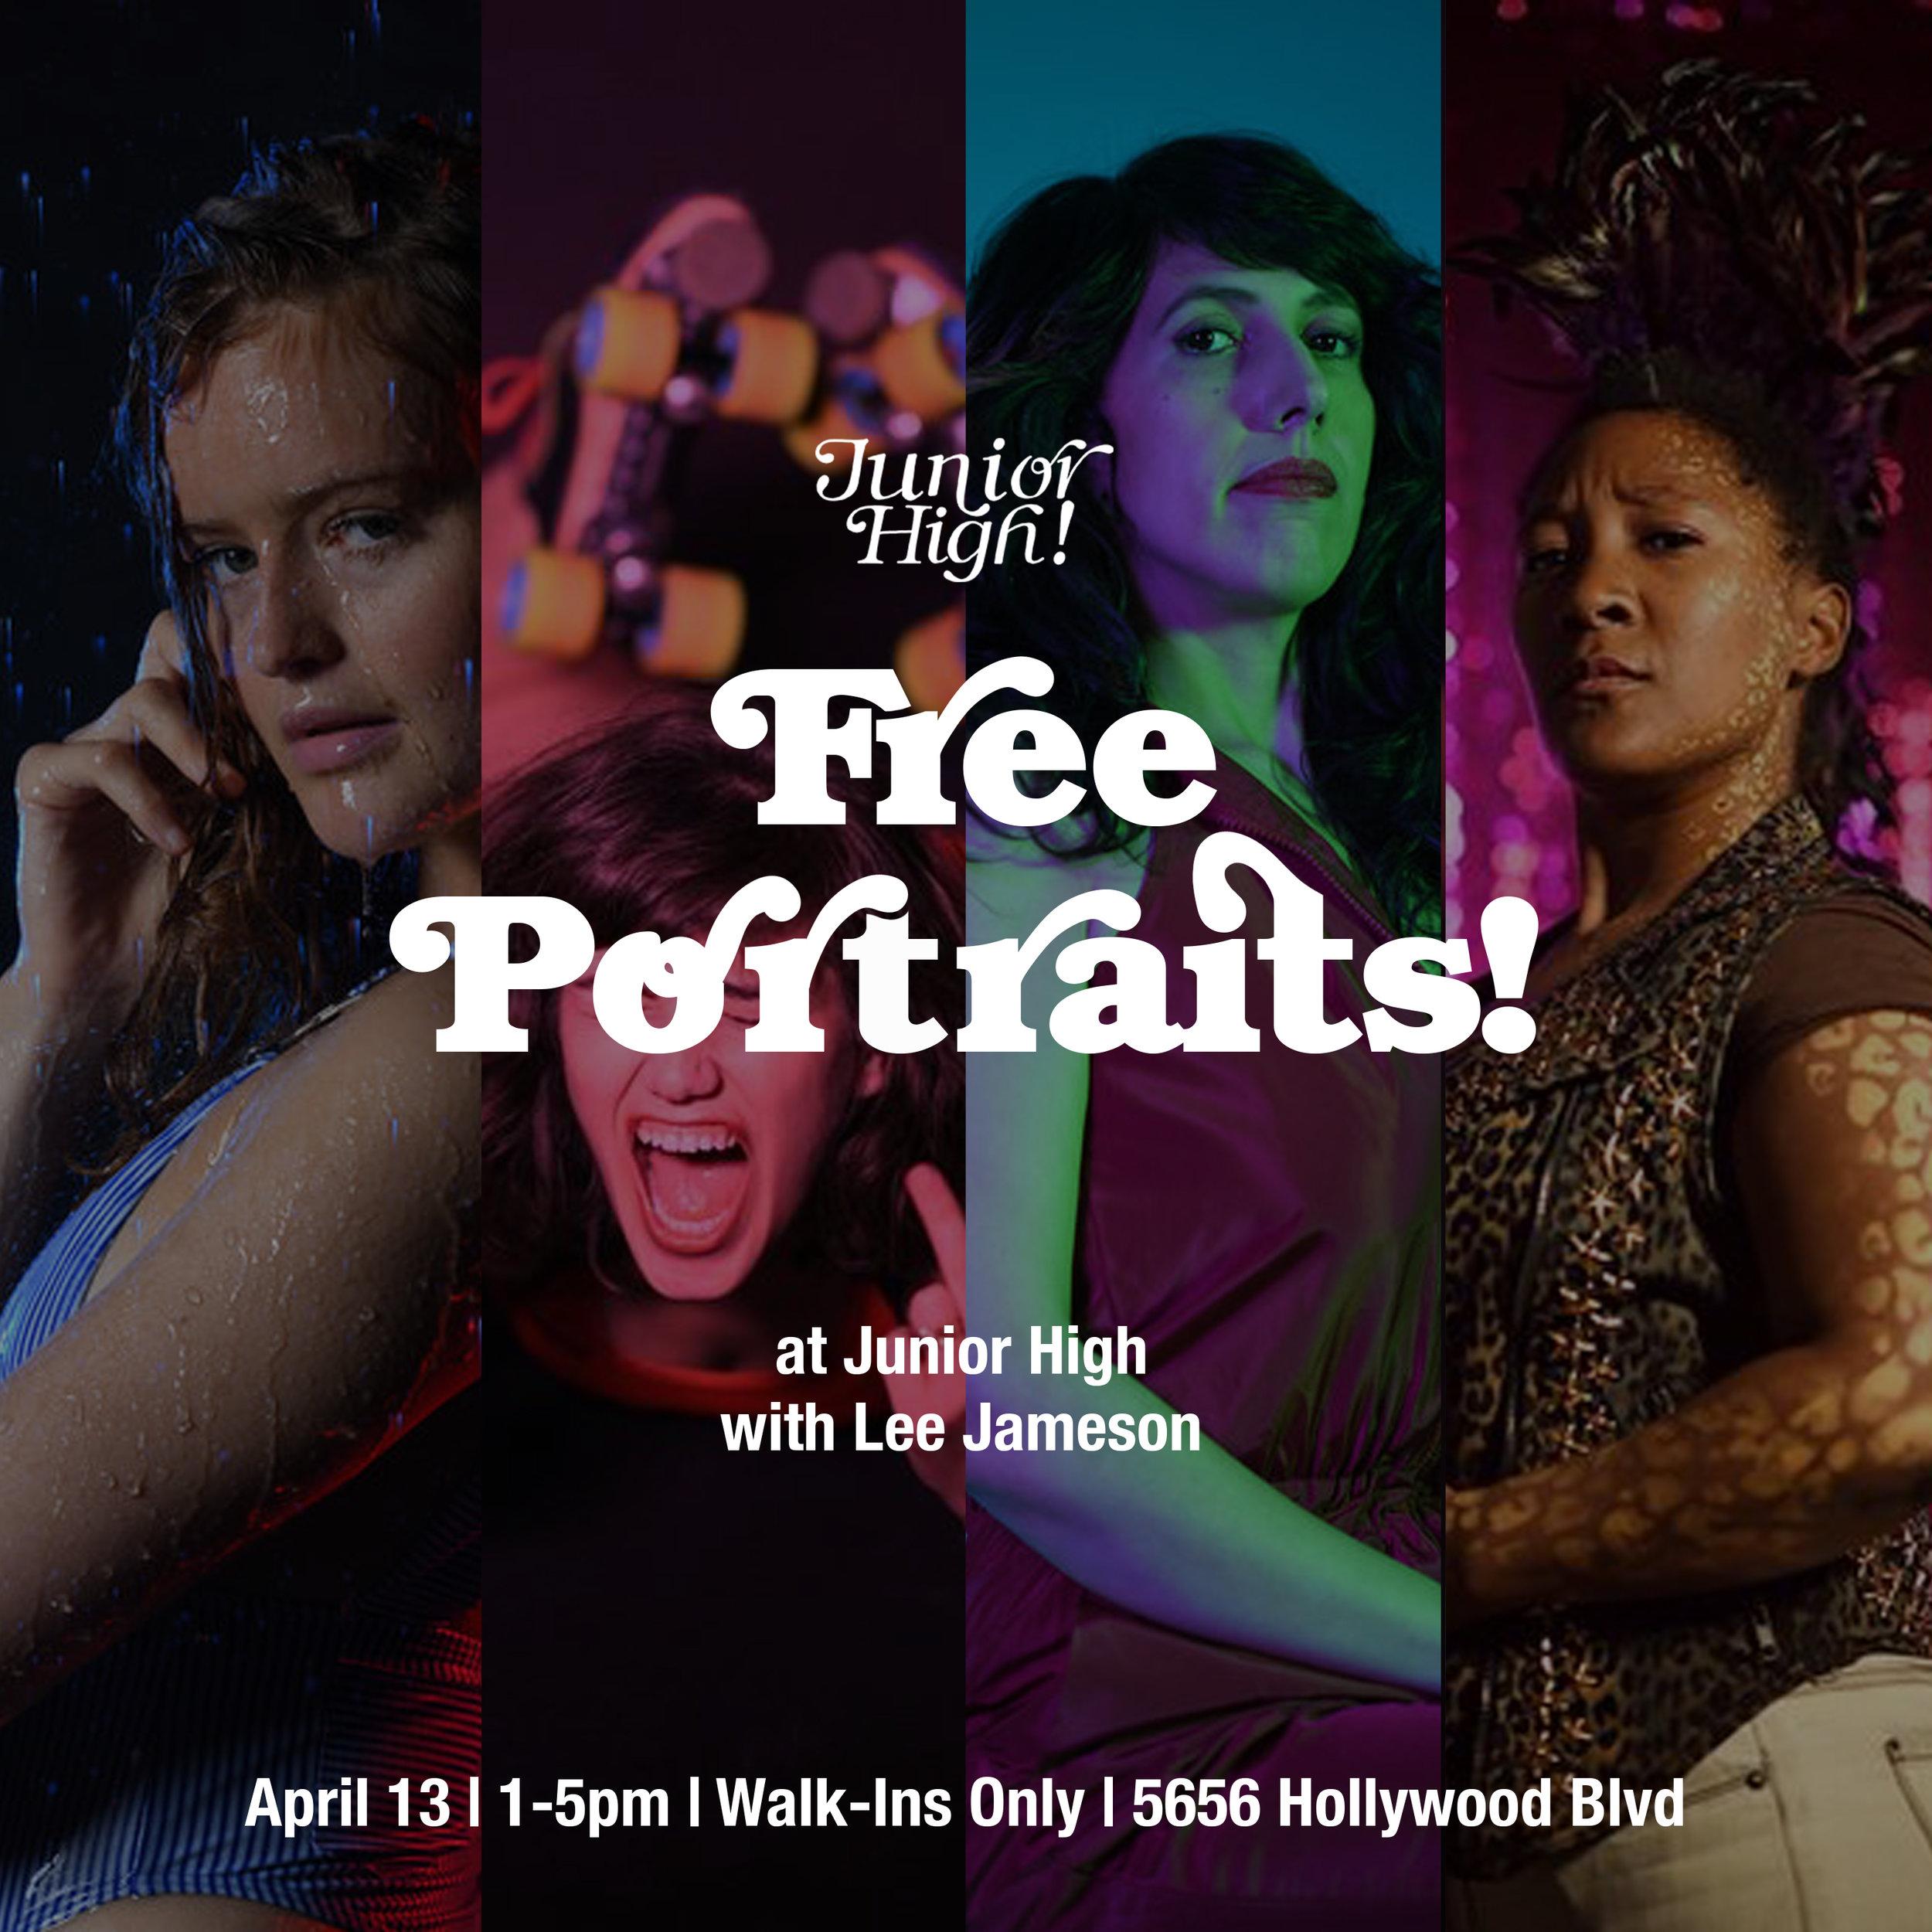 FreePortraits.jpg